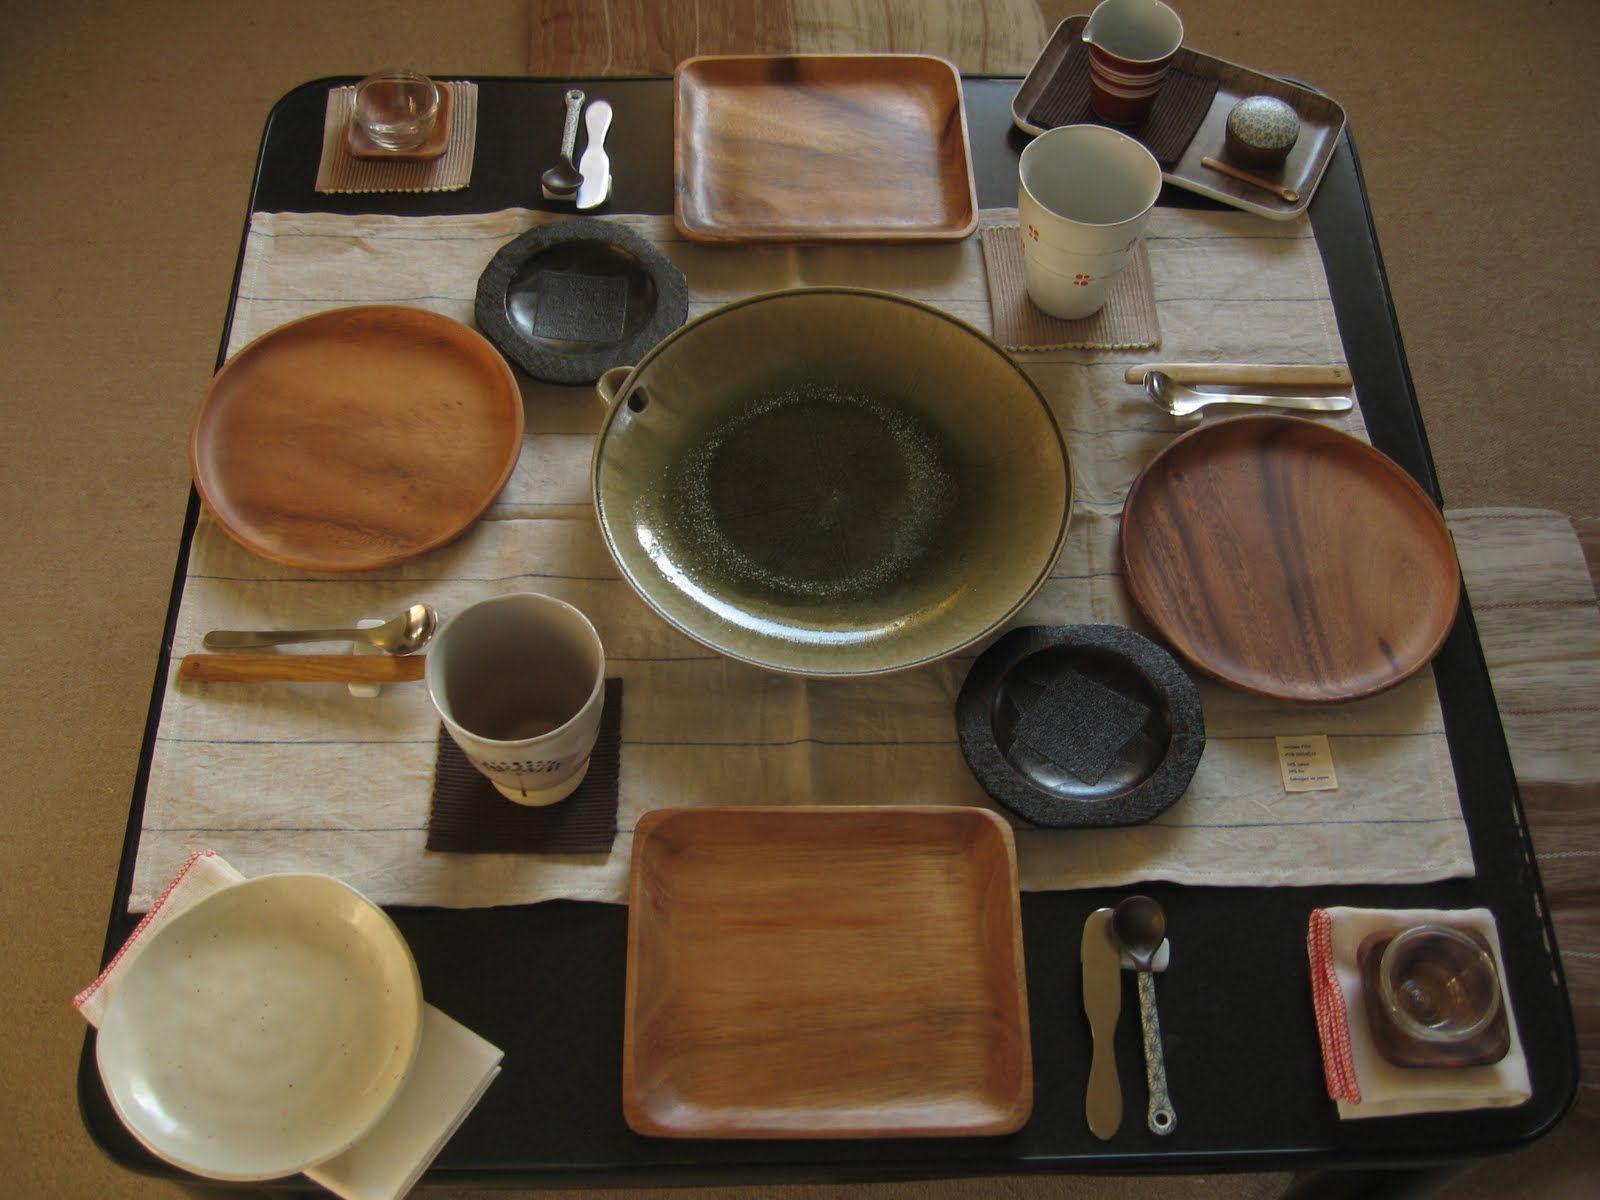 Japanese table setting | Dream kitchen ideas | Pinterest | Japanese ...